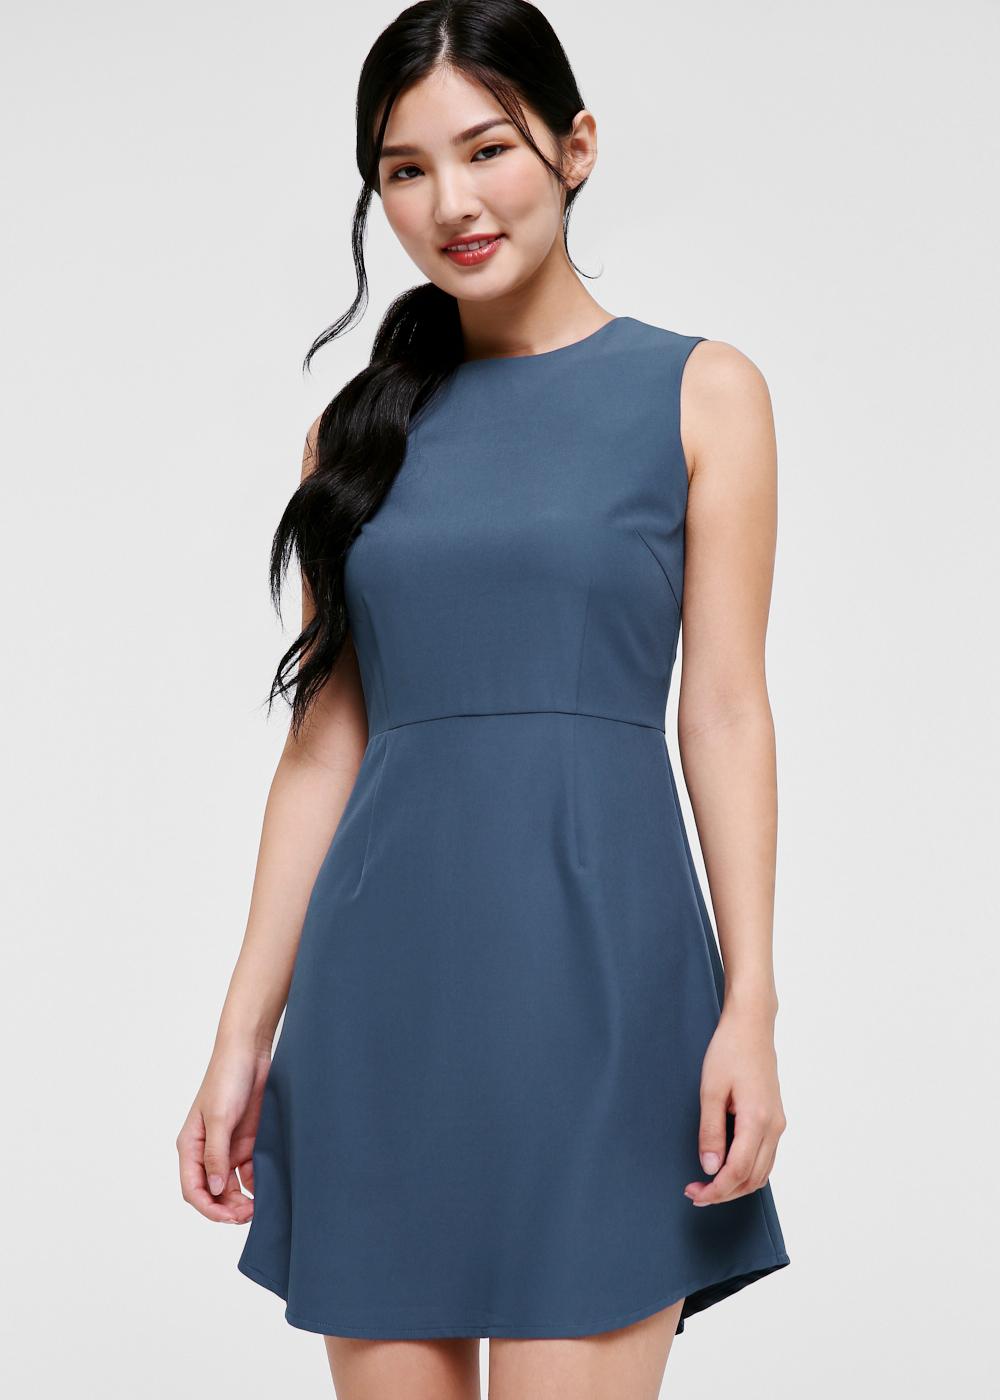 Desiree Curved Hem A-line Dress-231-XS